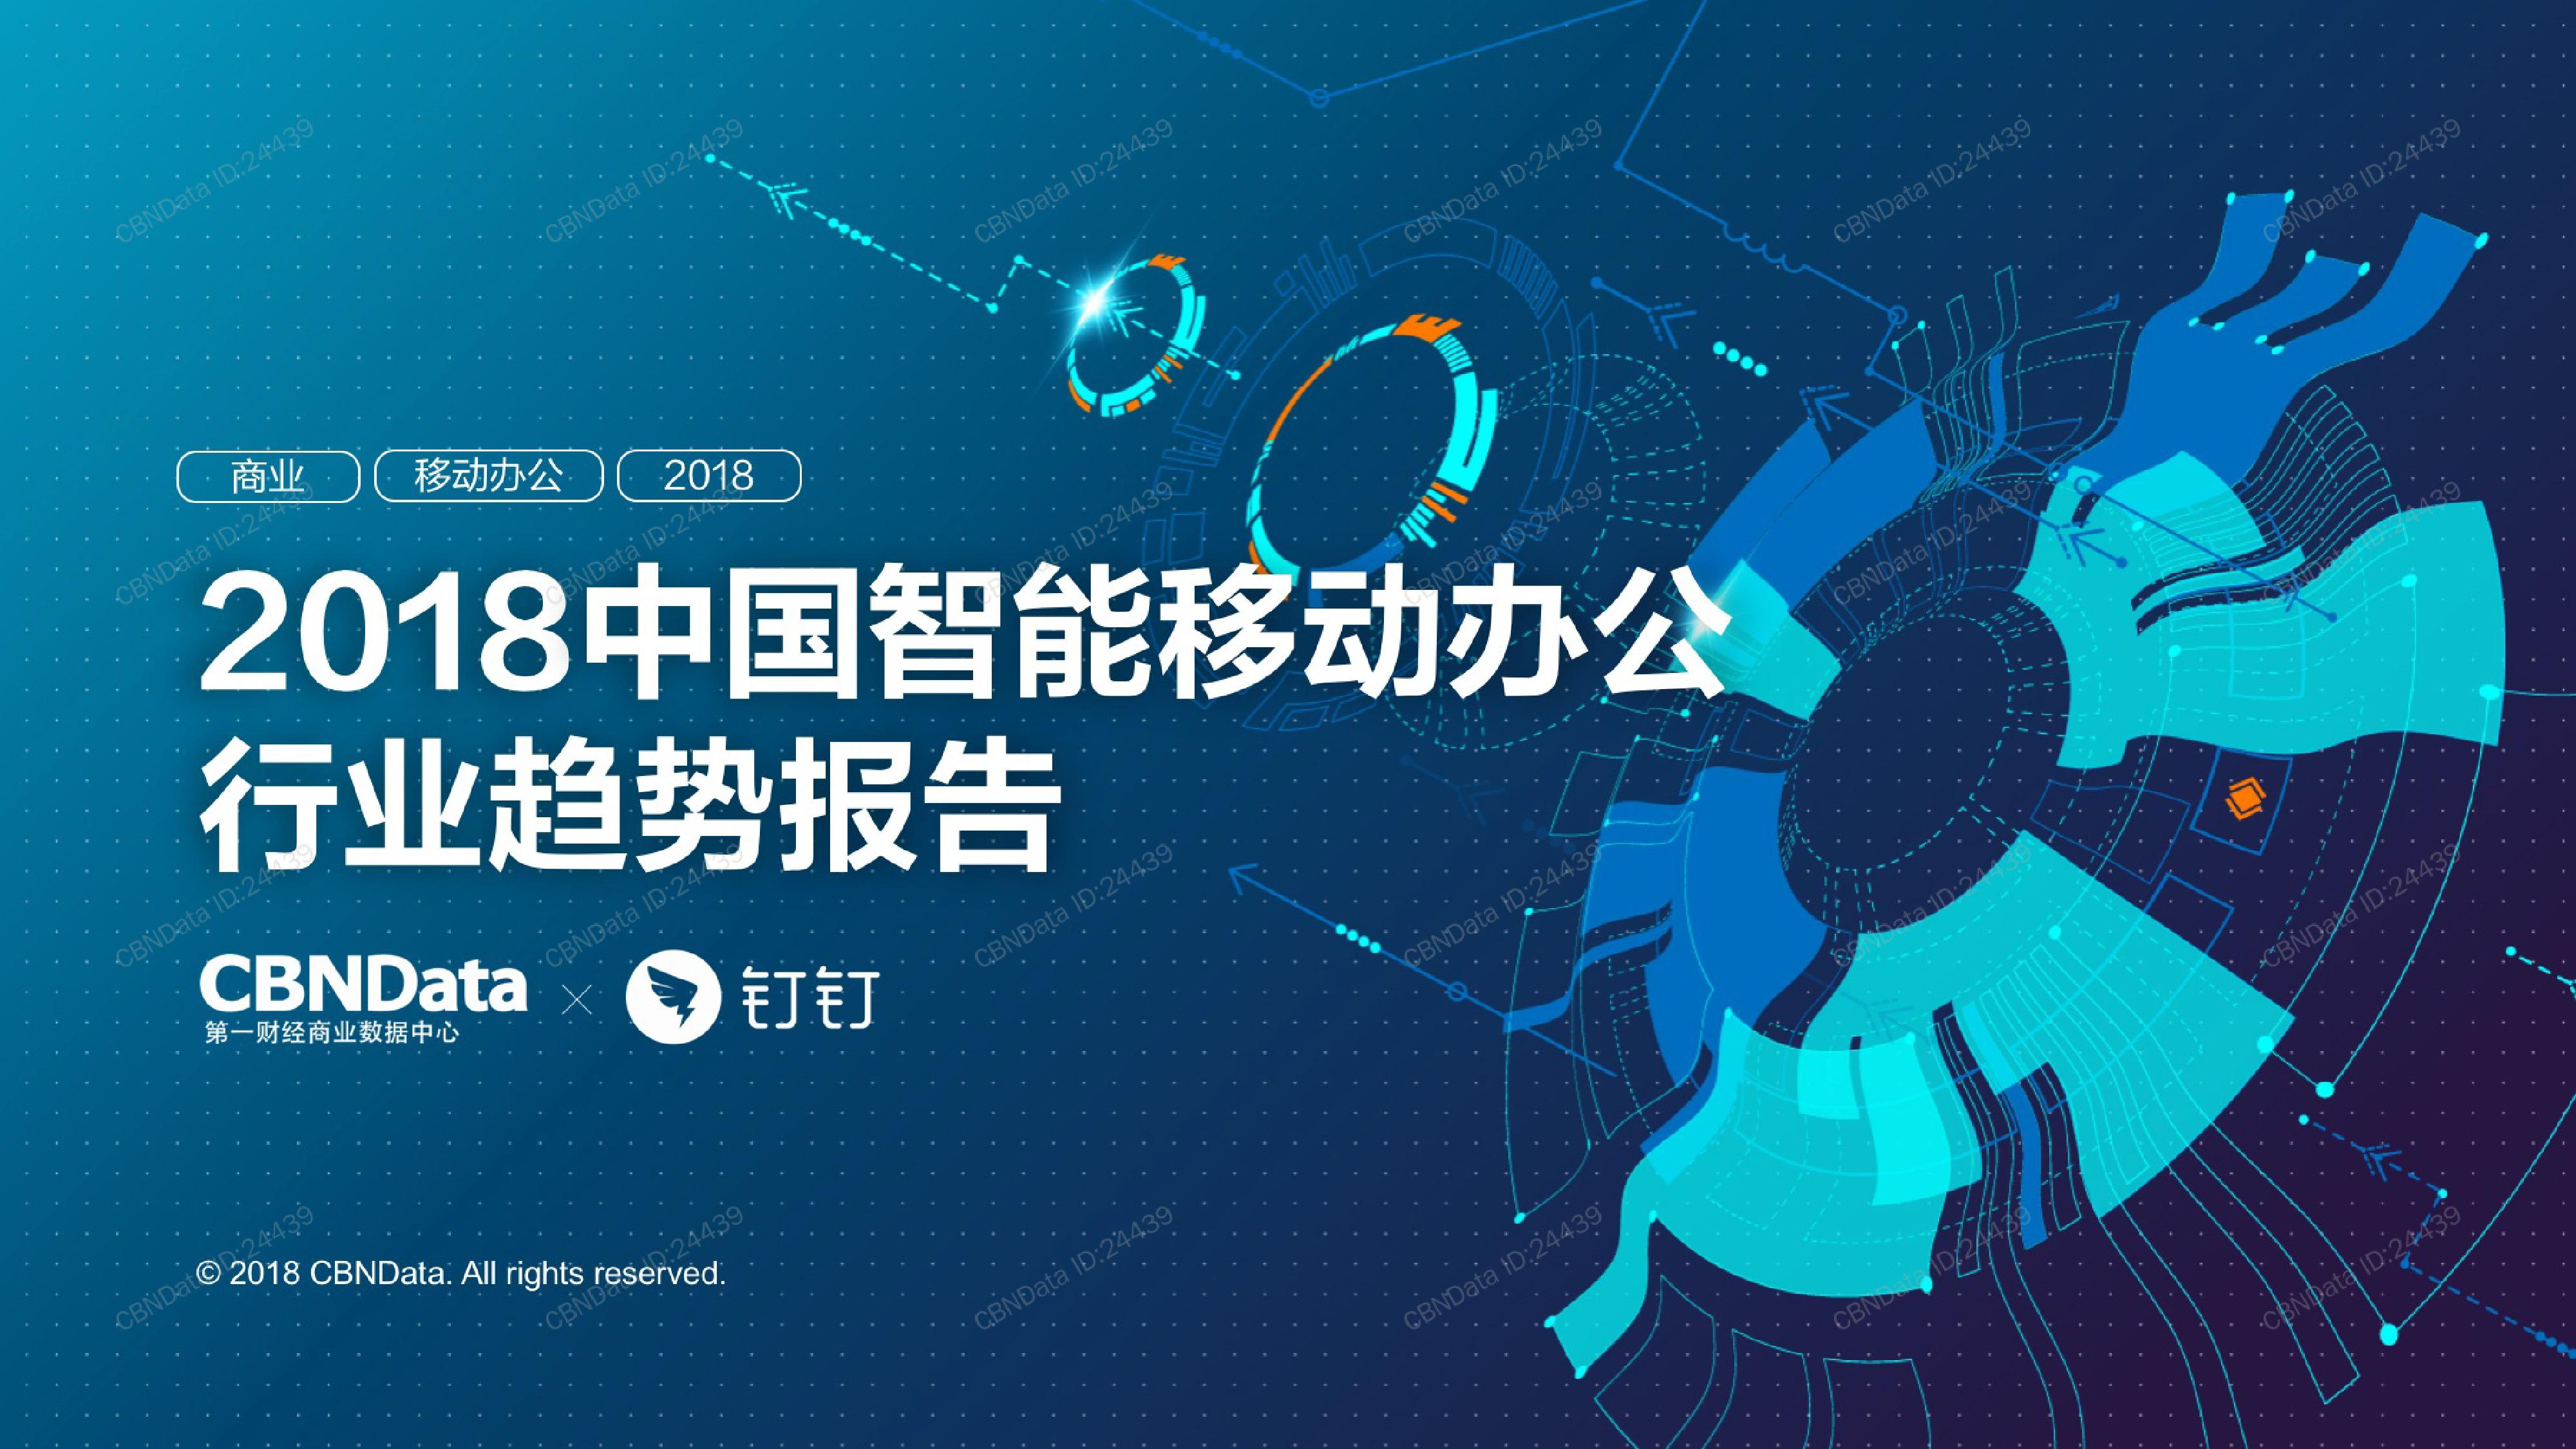 CBNData& 钉钉:2018中国智能移动办公行业趋势报告(附下载)